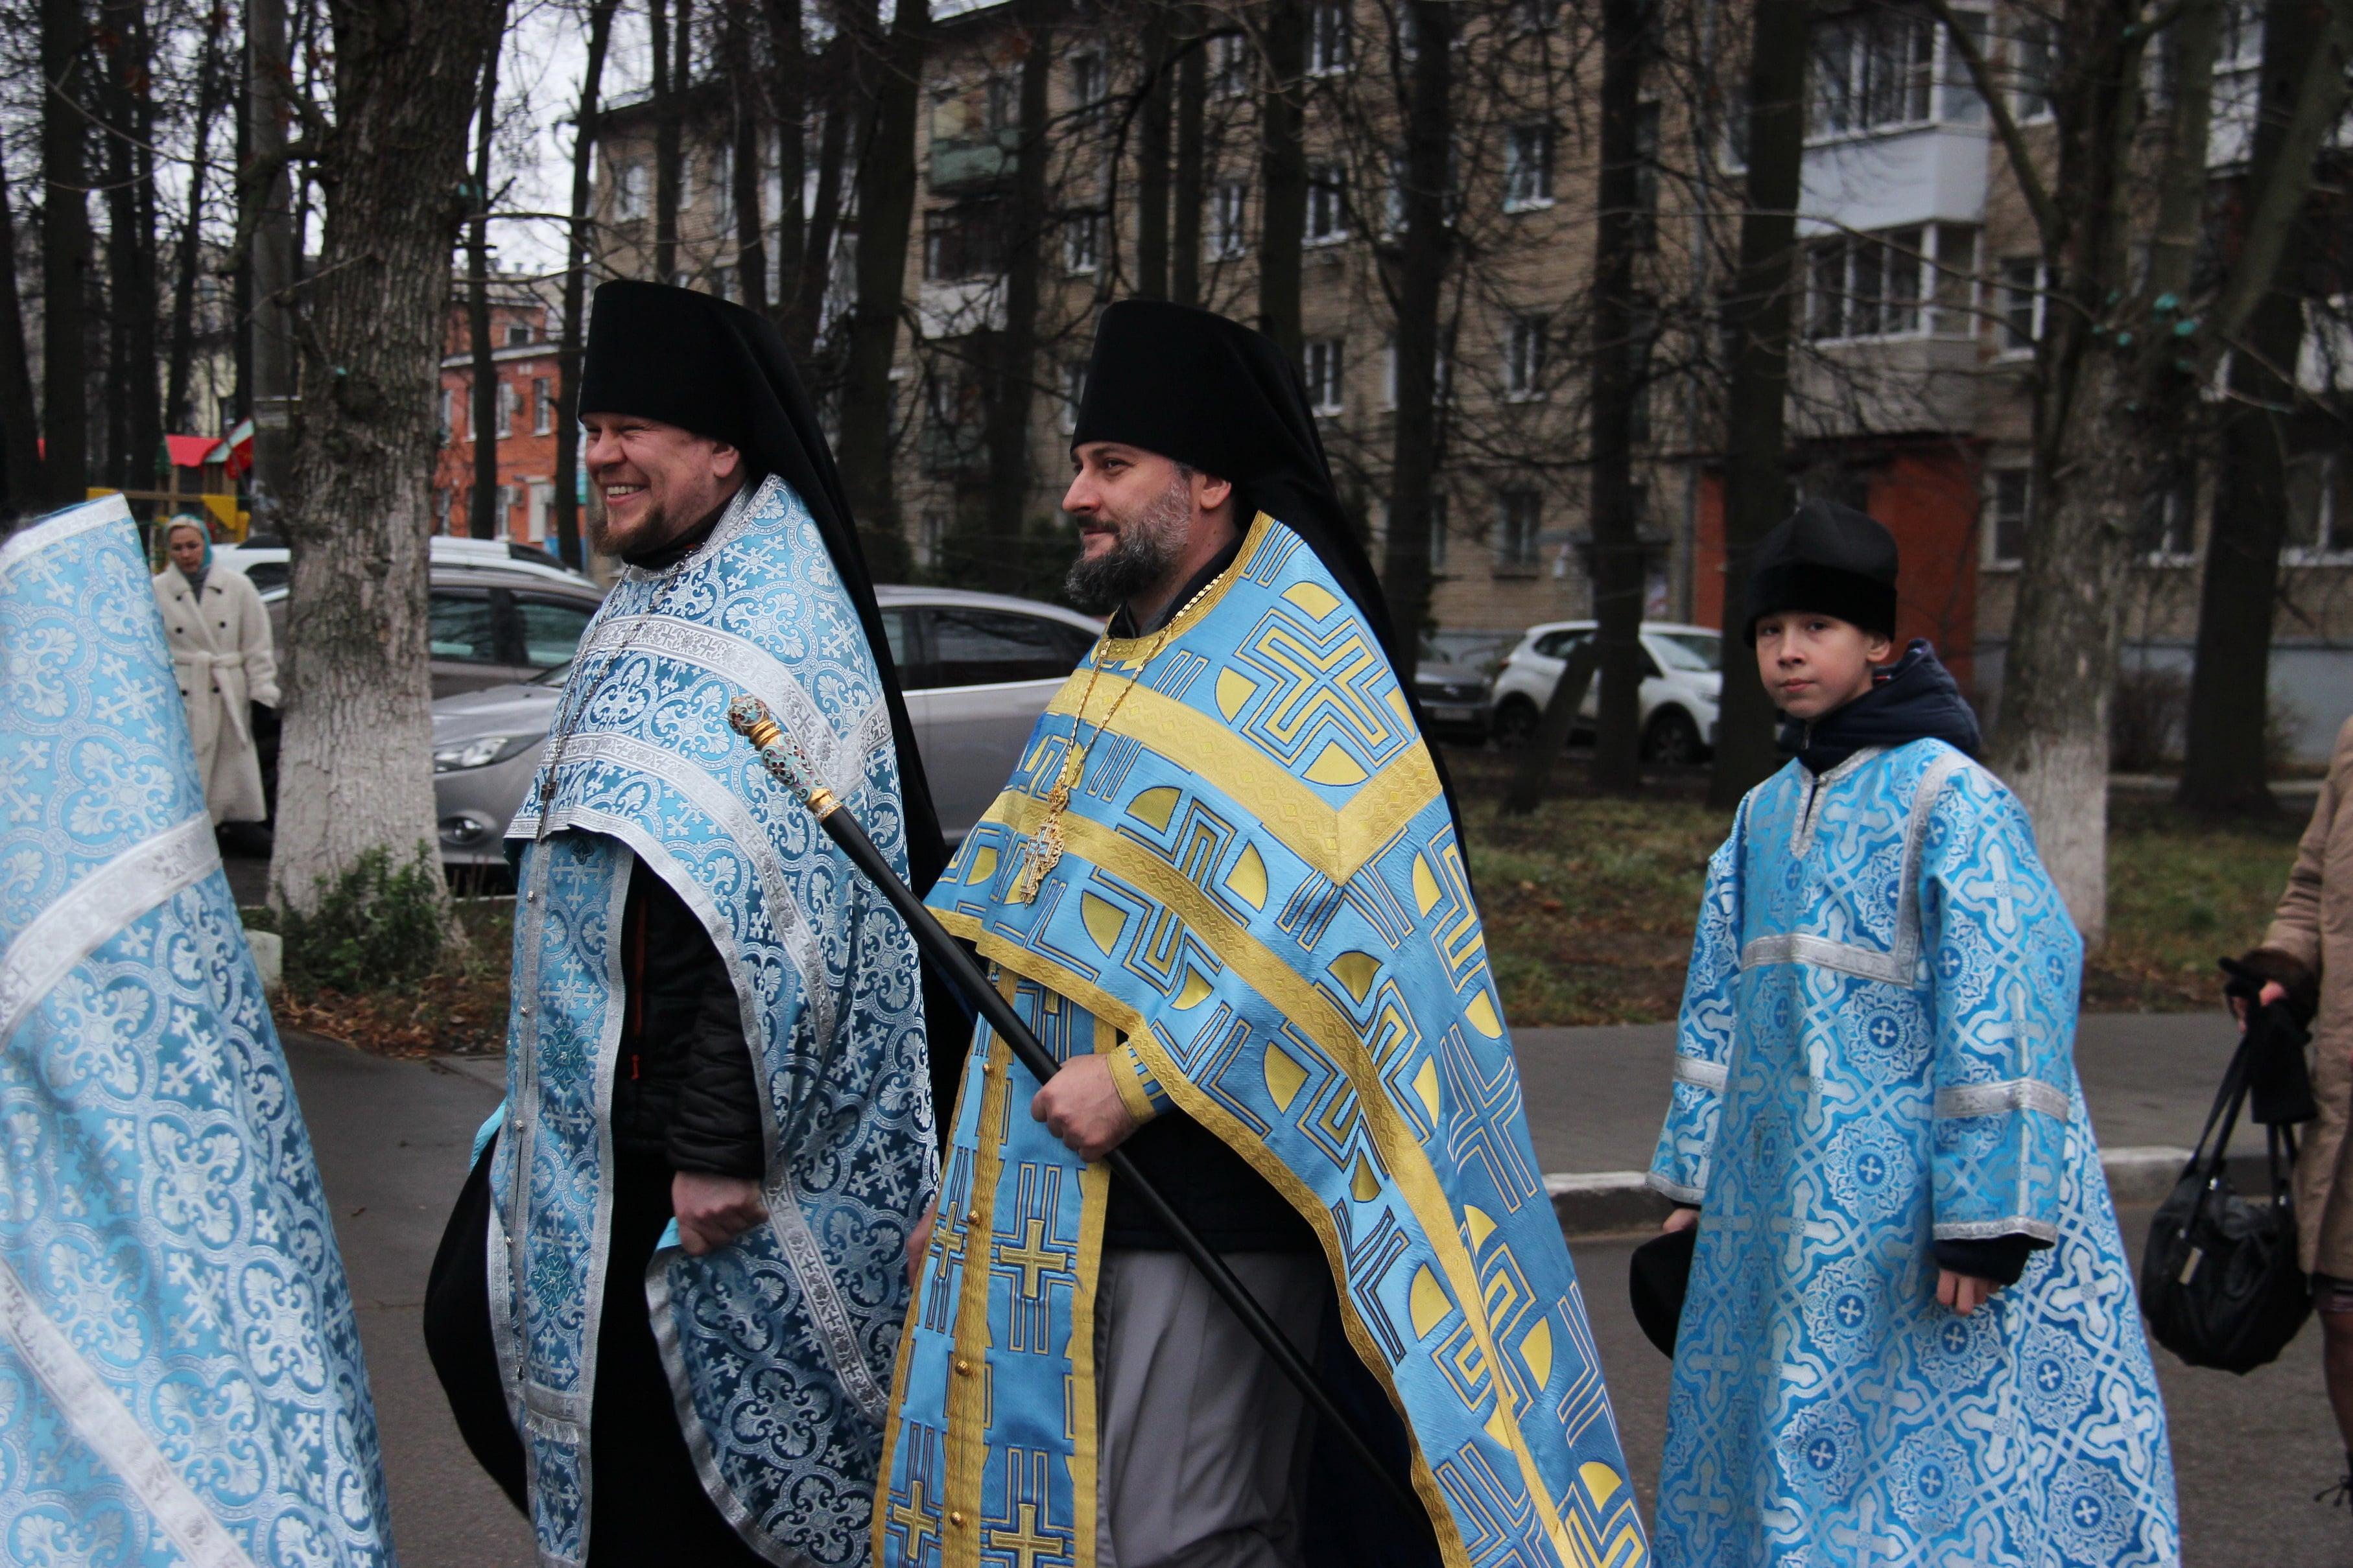 http://monuspen.ru/photoreports/e885ad143ffeae12541ceee7e7725b1o.JPG